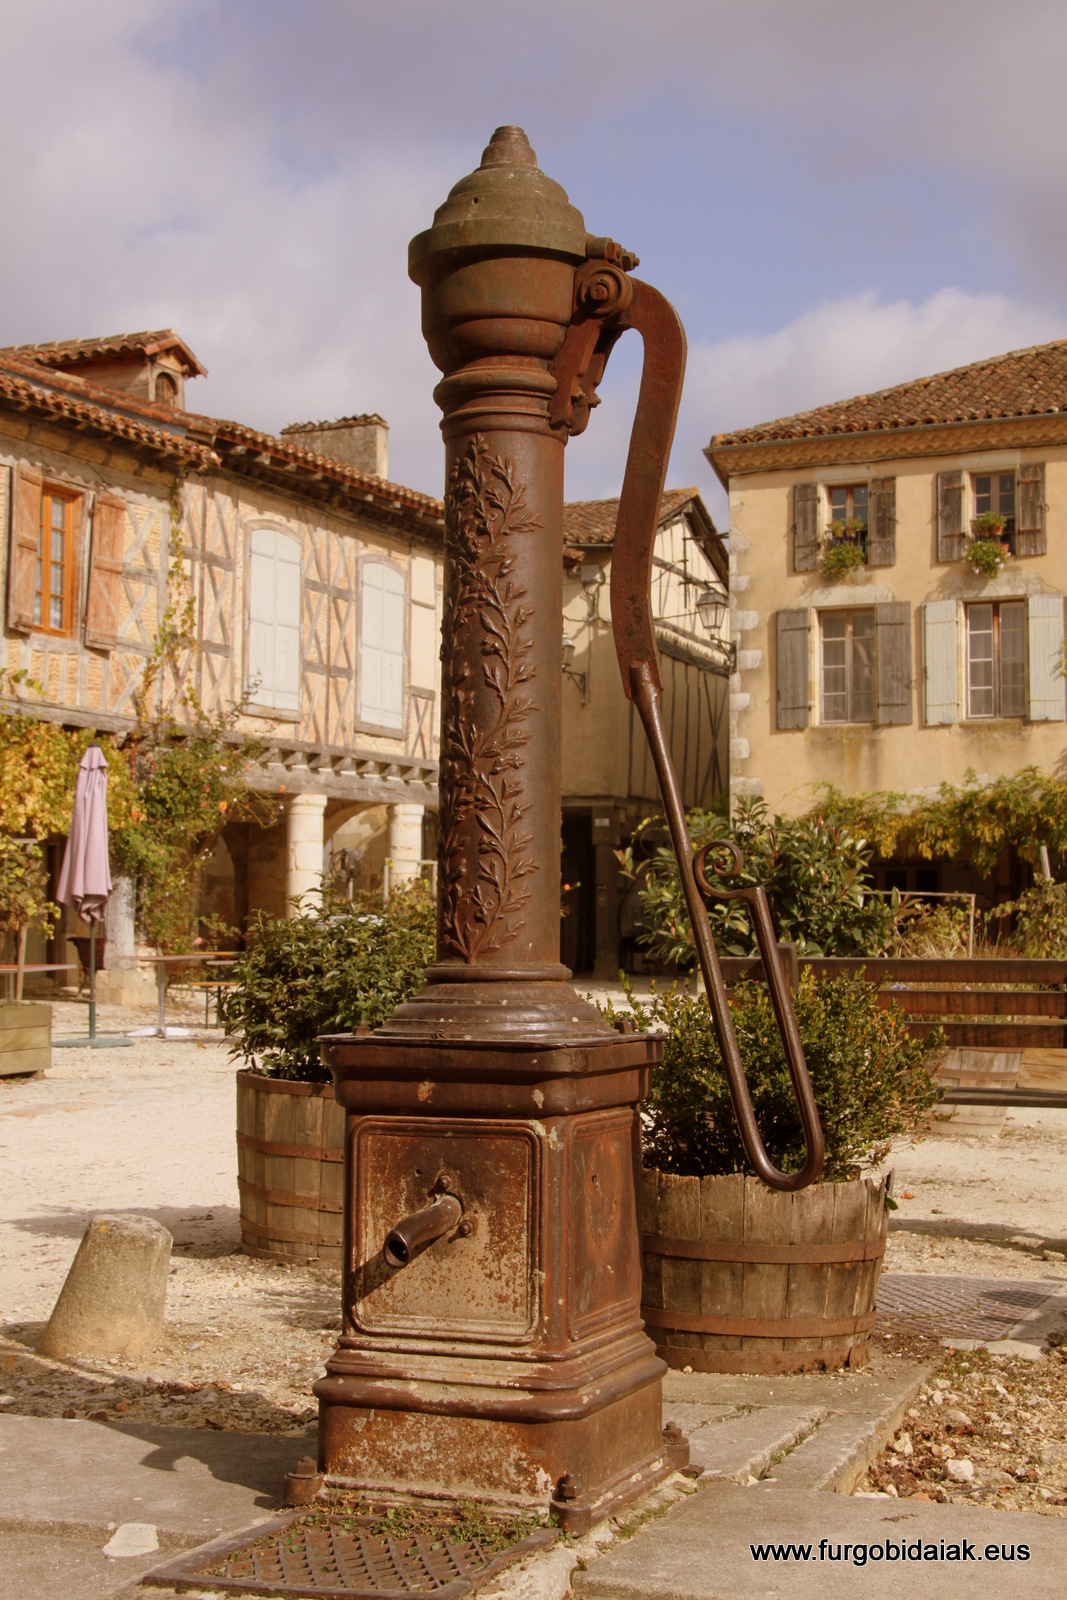 Antigua bomba de agua, Armagnac